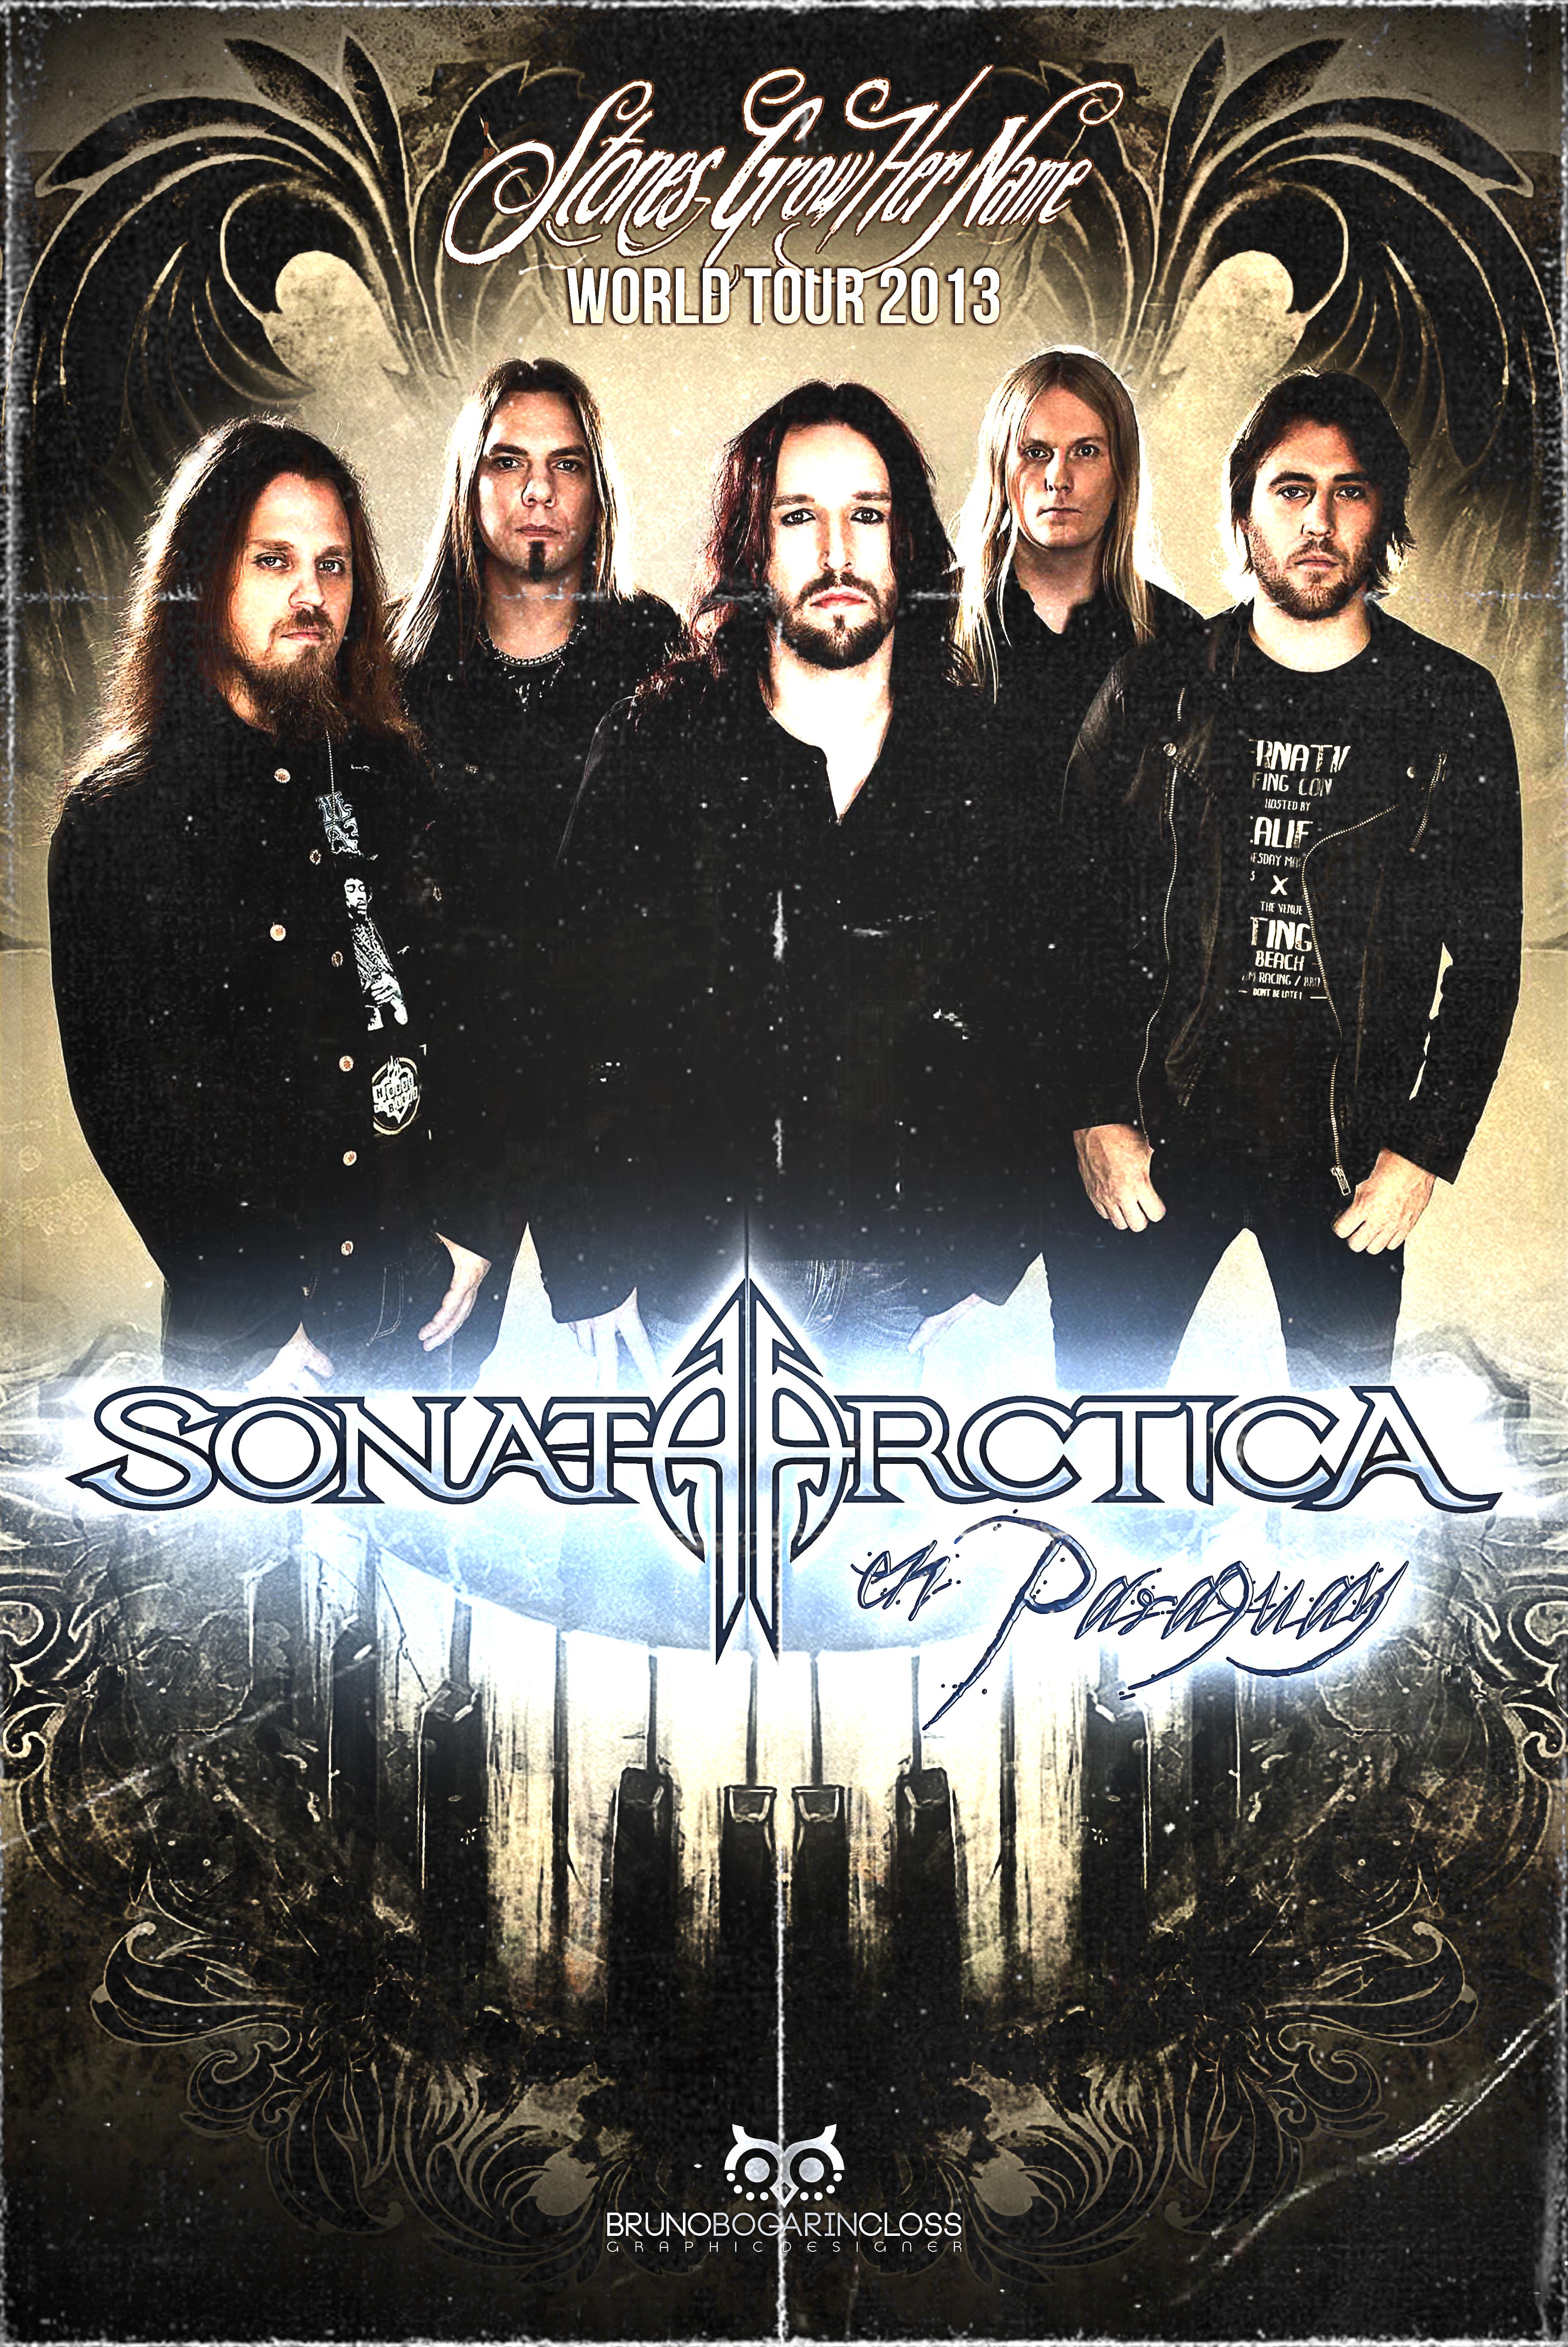 Sonata Arctica Show en Paraguay